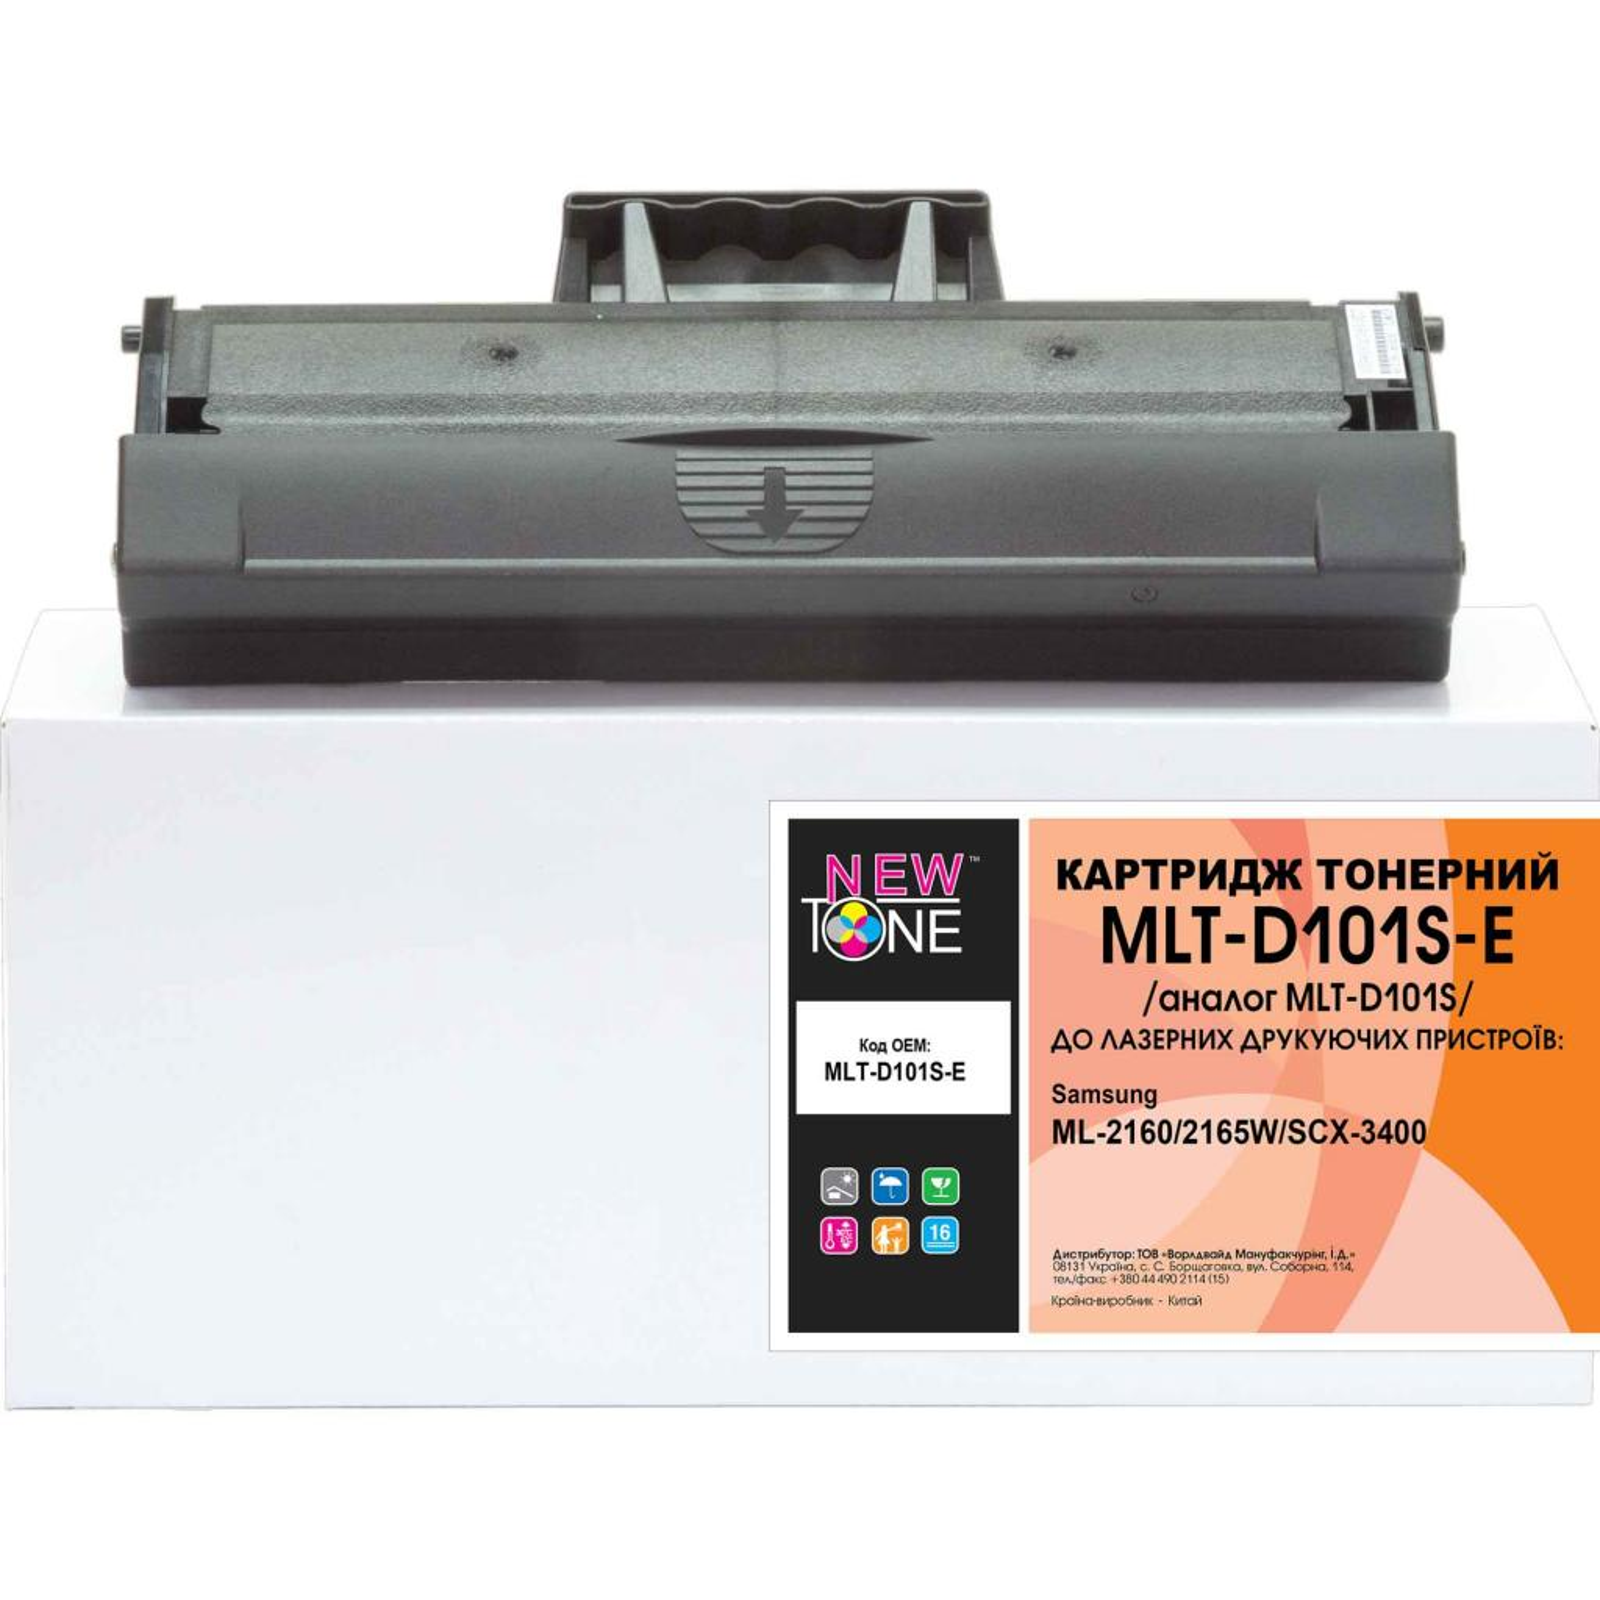 Картридж NewTone для Samsung ML-2160/2165W/SCX-3400 (MLT-D101S-E)